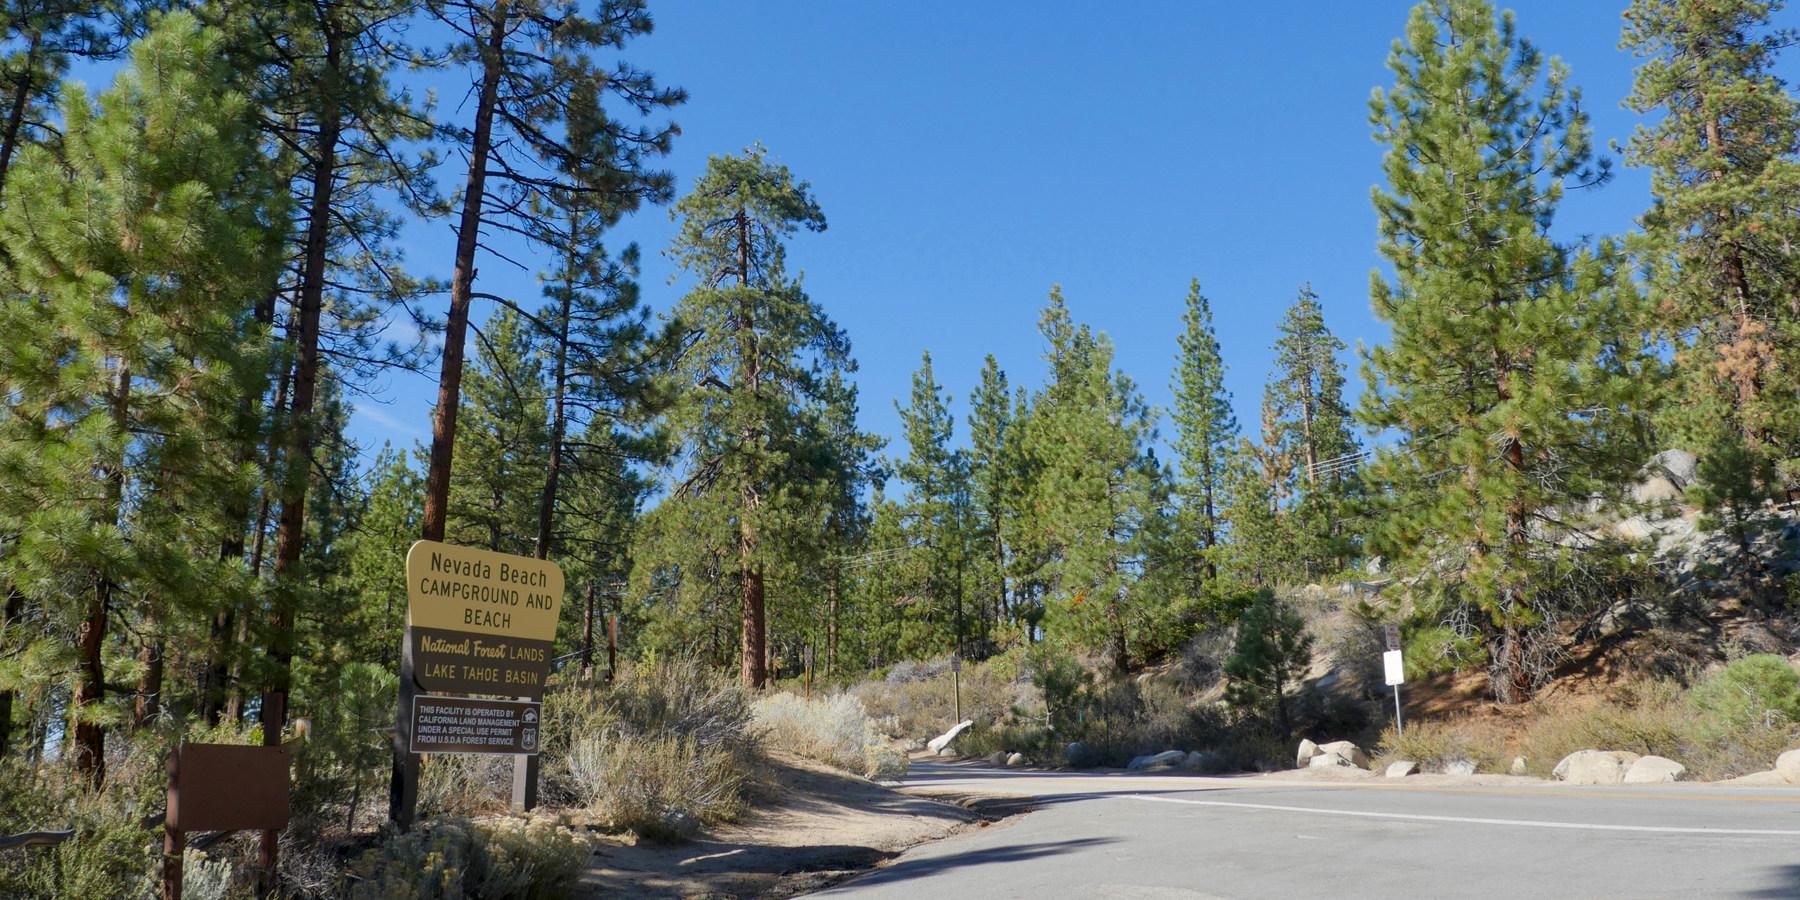 Entrance Sign At Nevada Beach Campground